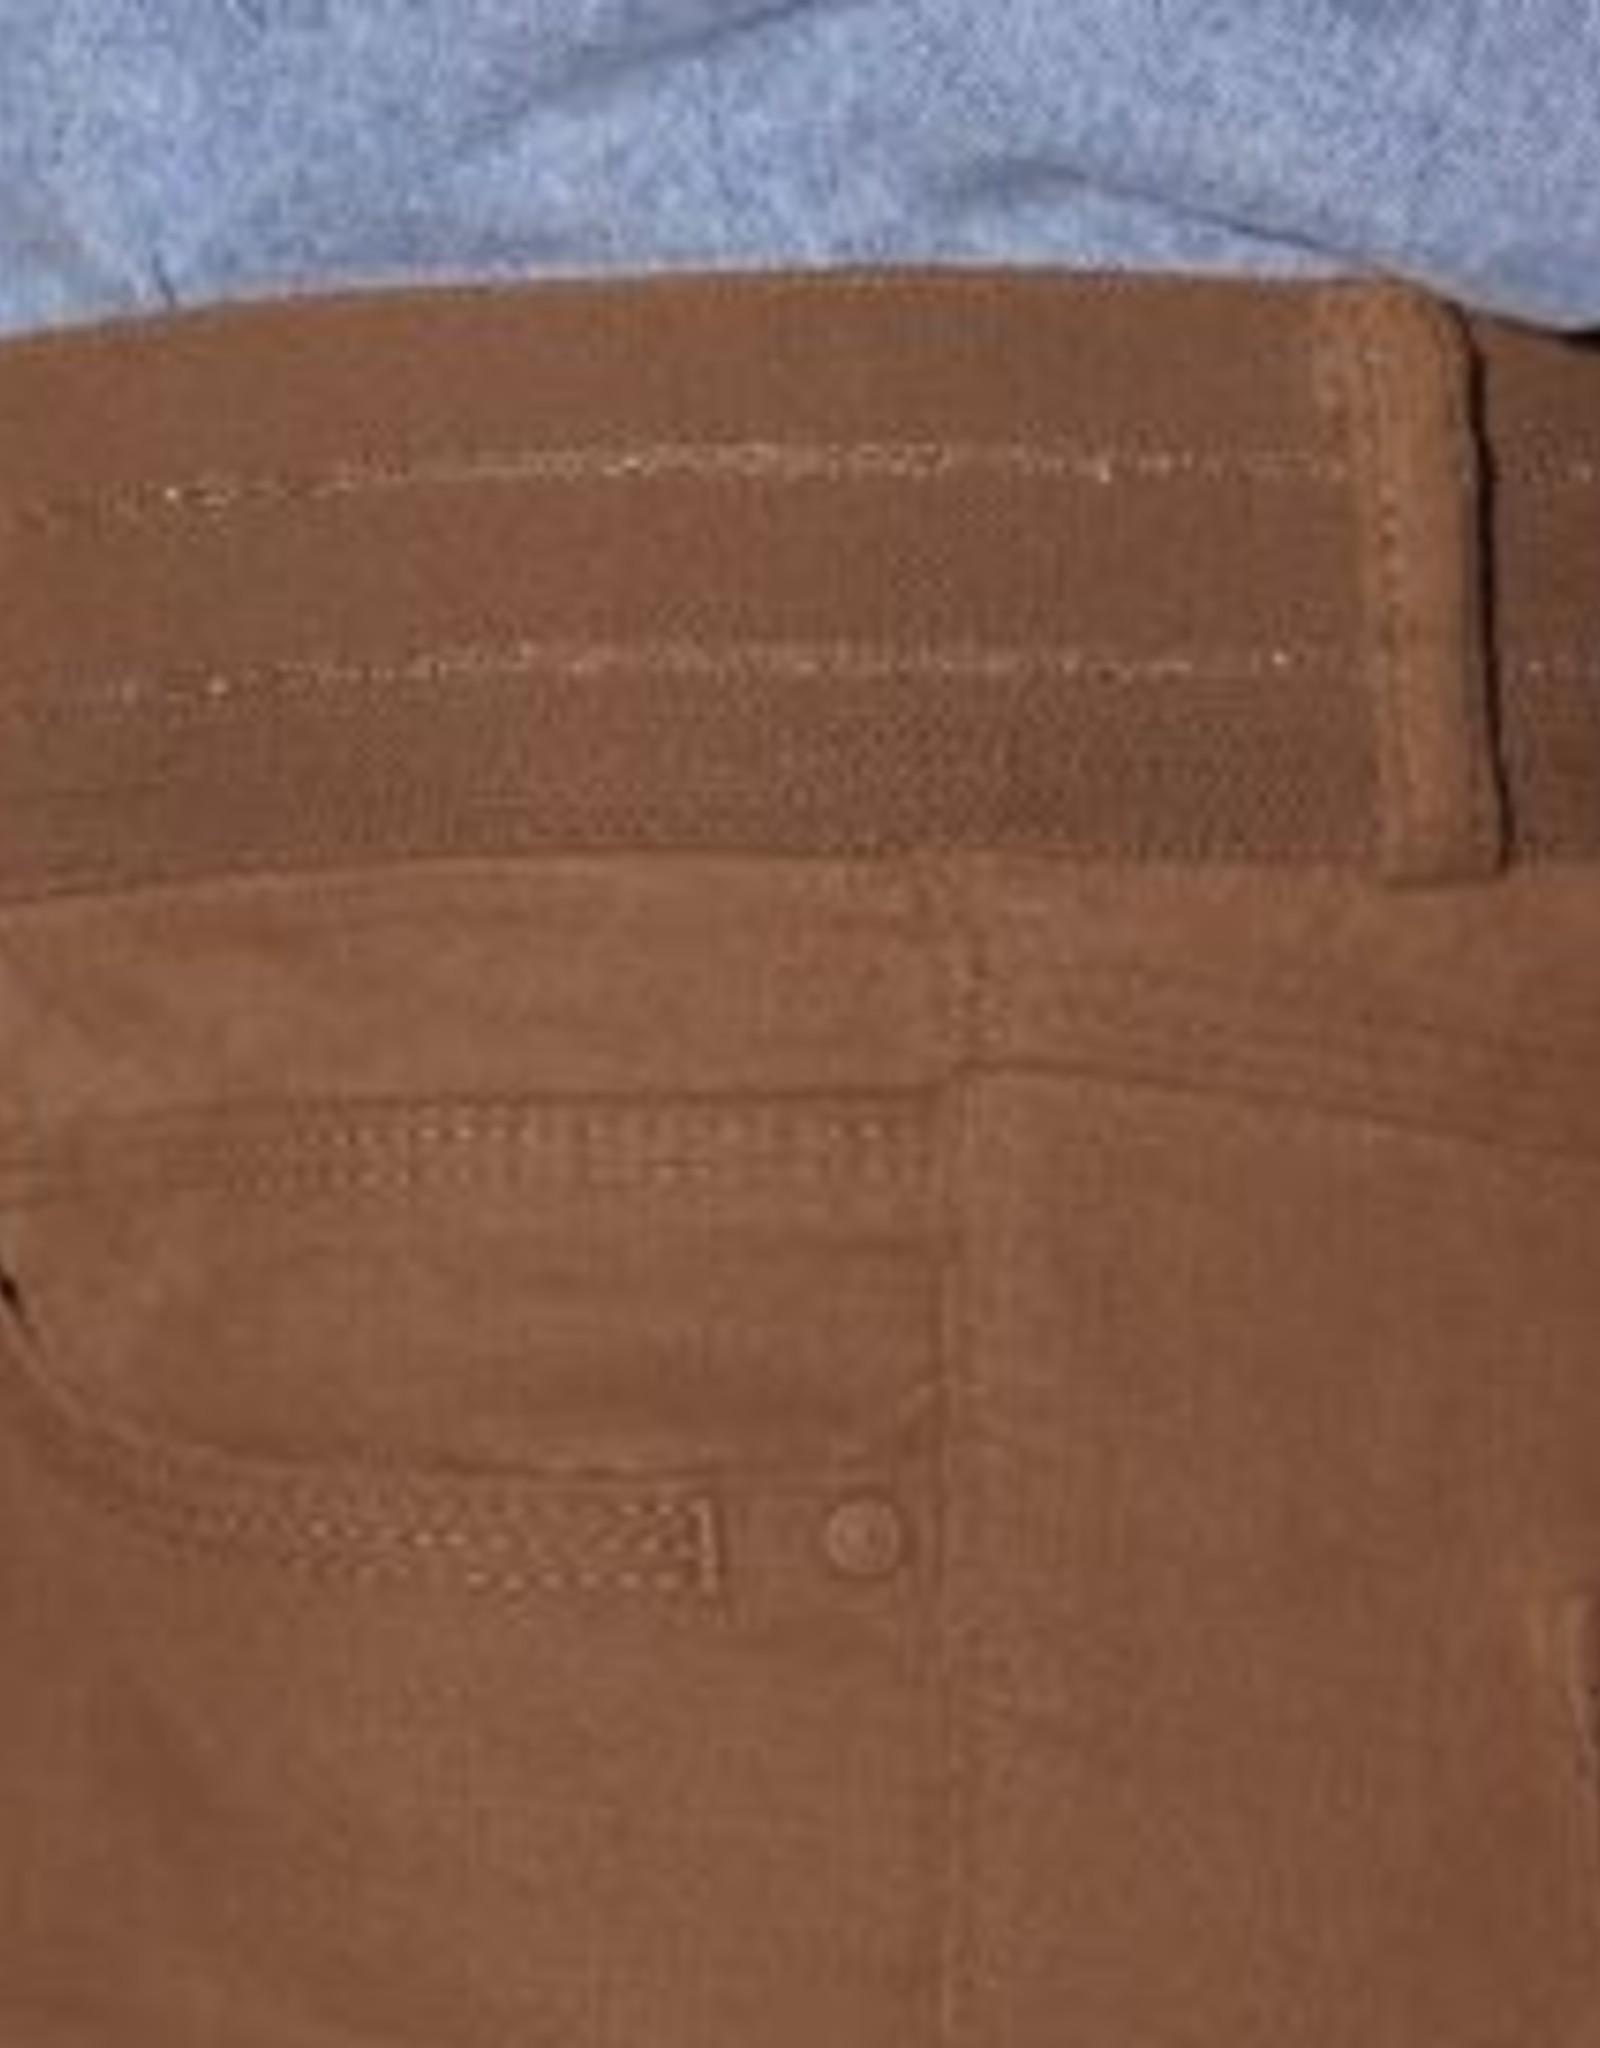 Para MI Pantalon Celine Elastic Velvet Camel